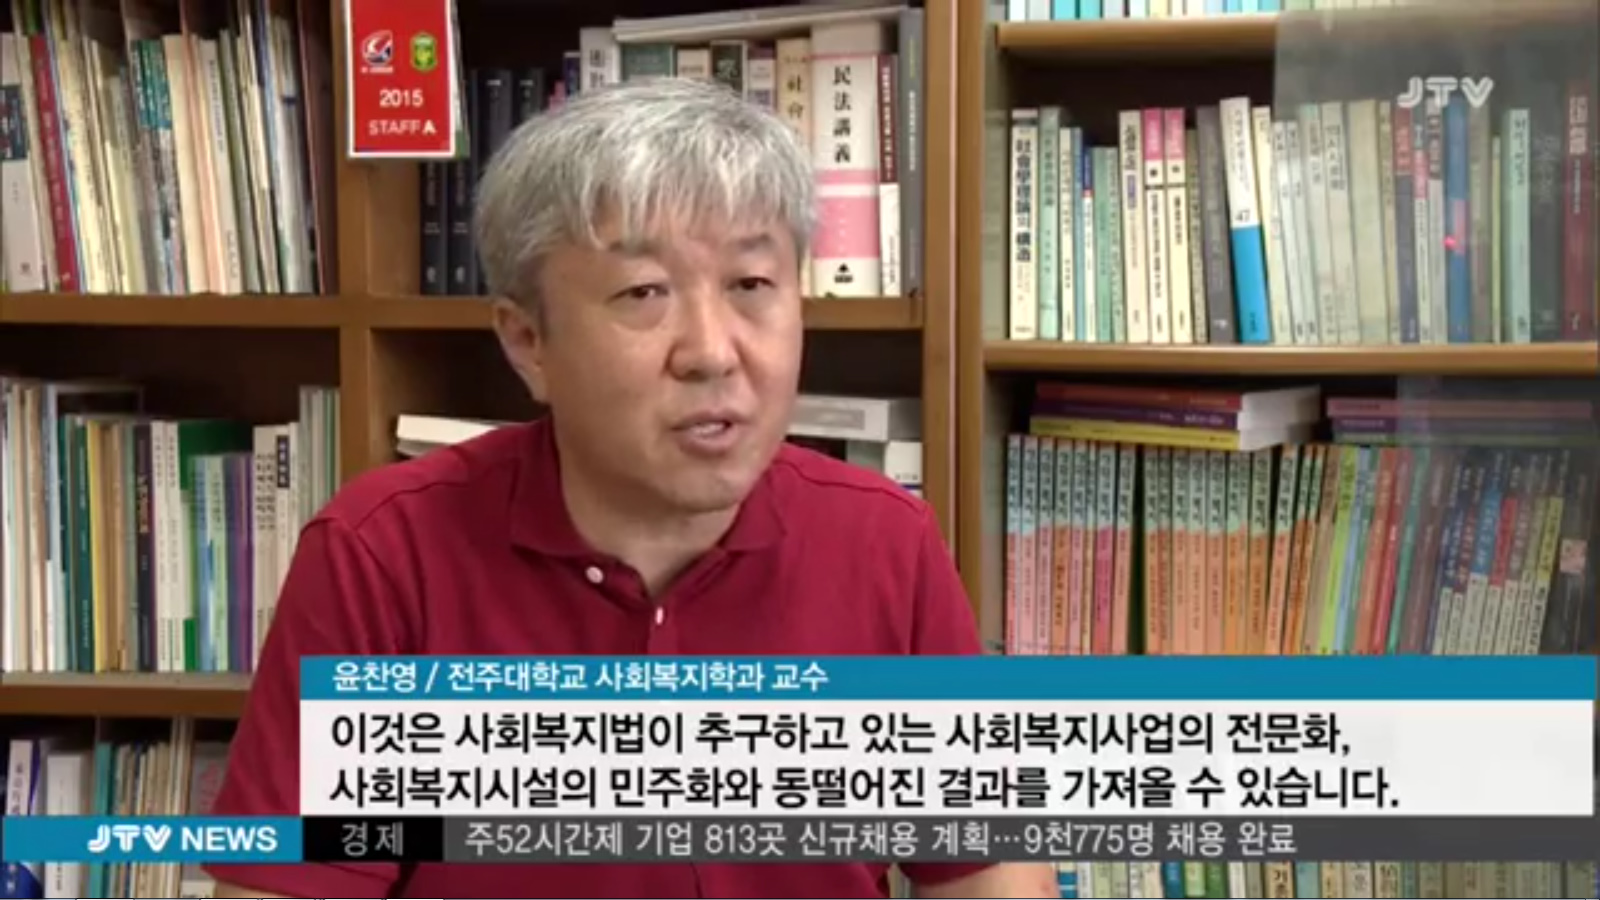 [18.7.25 JTV] 전주 봉침게이트, 검찰은 기소축소 법원은 재판거래... 의혹24.jpg